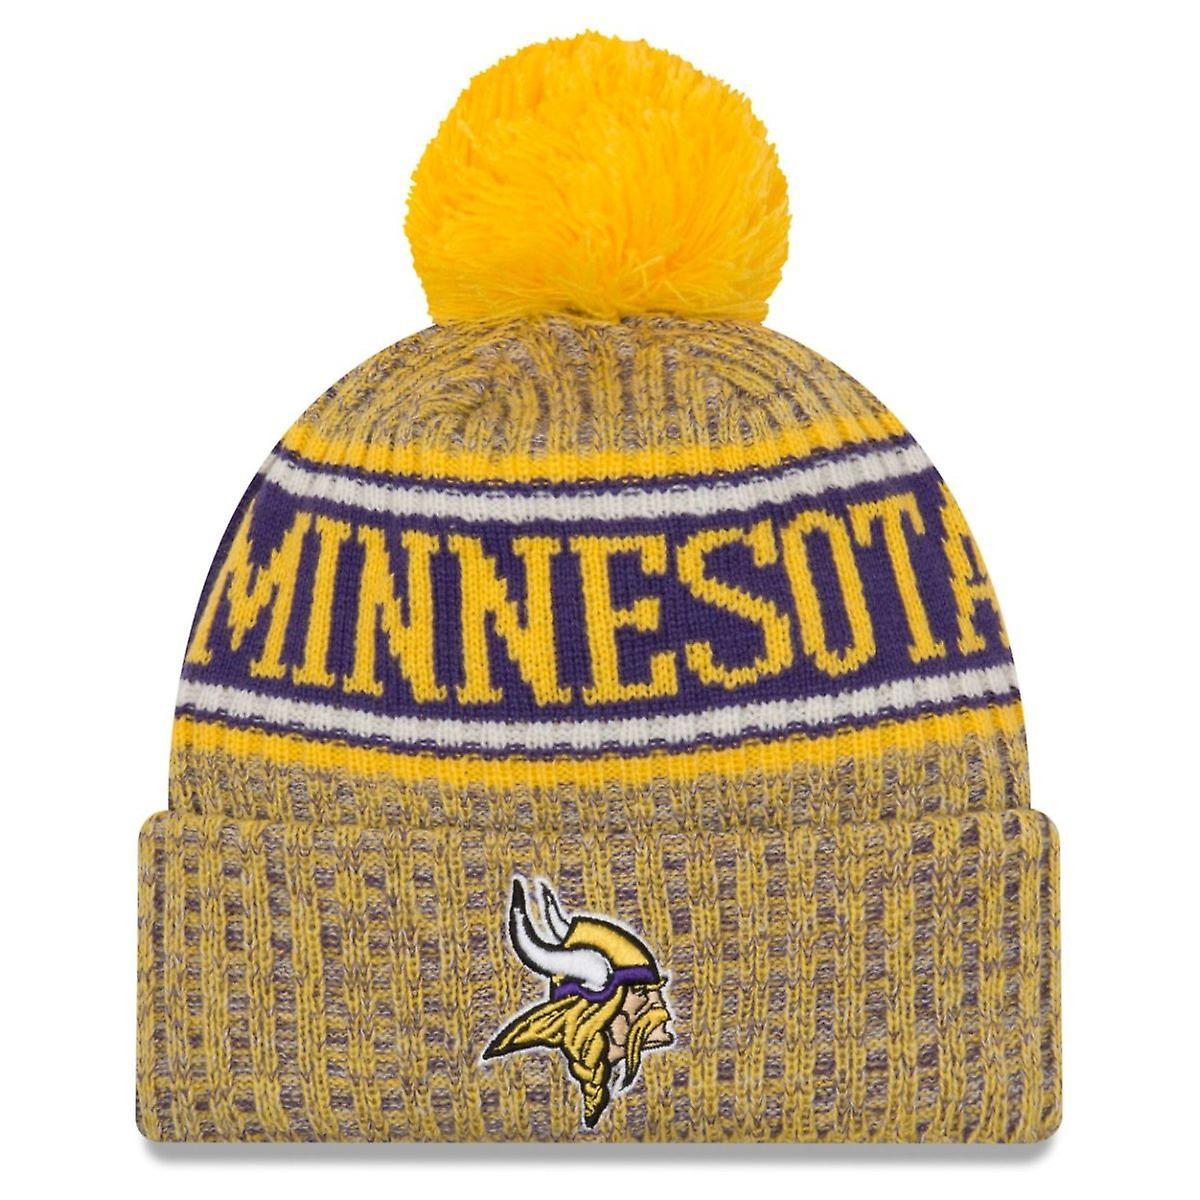 New era NFL sideline reverse Hat - Minnesota Vikings  d05b2f4a562